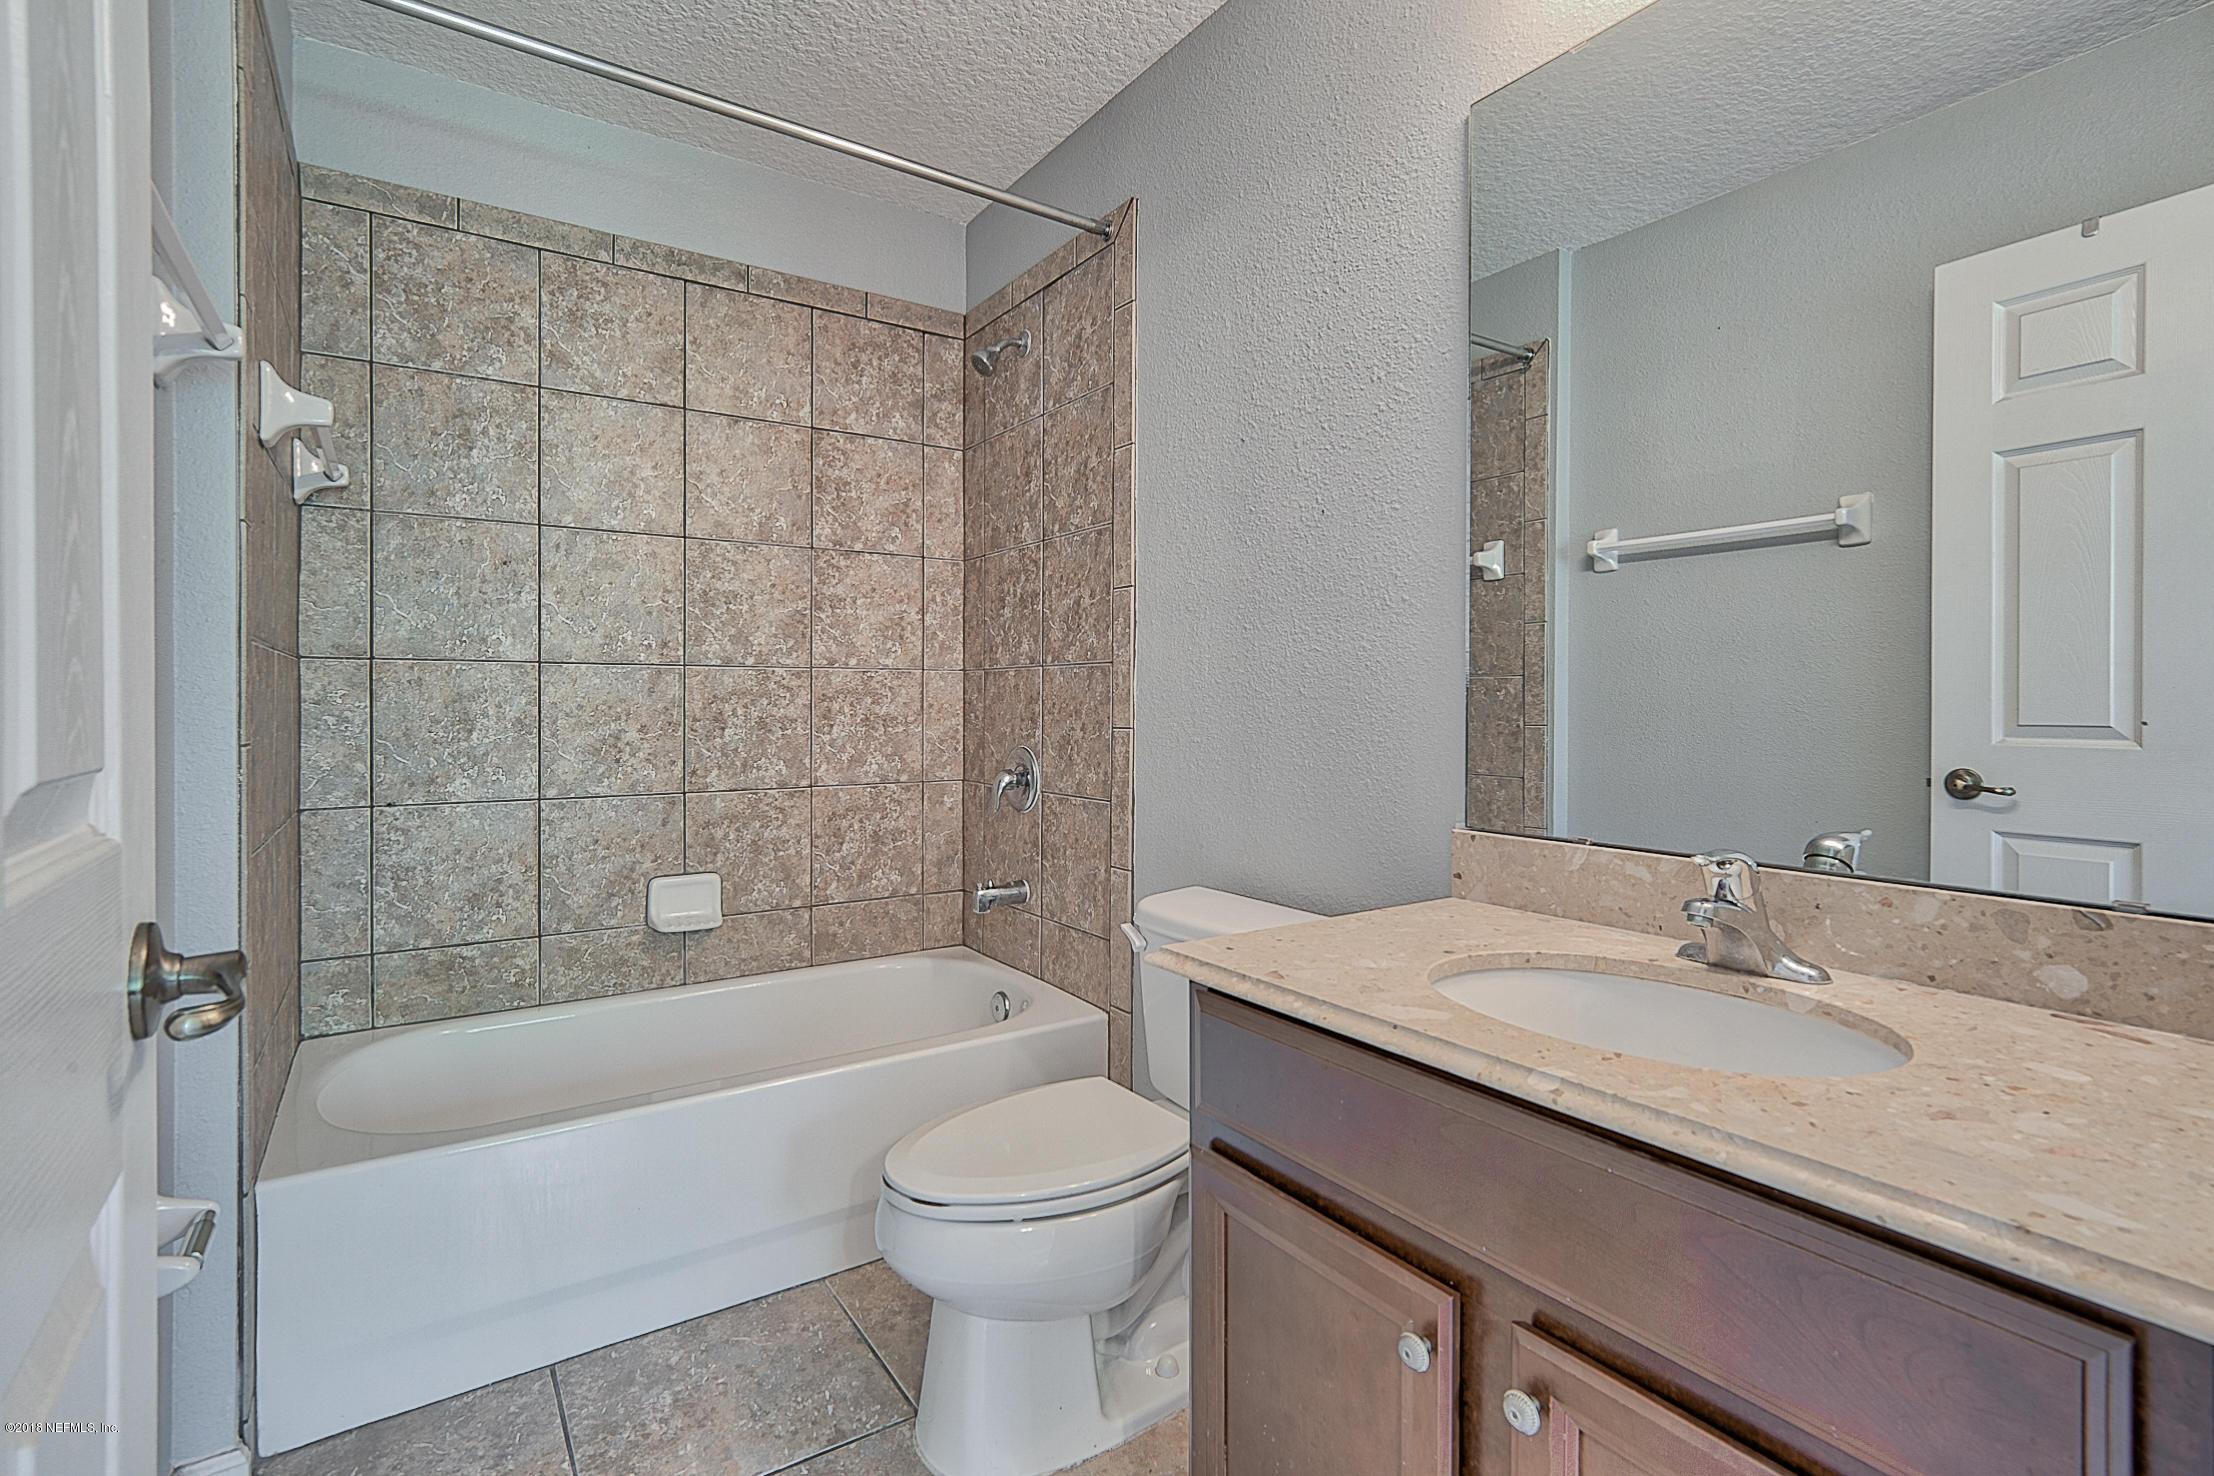 95275 POPLAR, FERNANDINA BEACH, FLORIDA 32034, 5 Bedrooms Bedrooms, ,3 BathroomsBathrooms,Residential - single family,For sale,POPLAR,954050